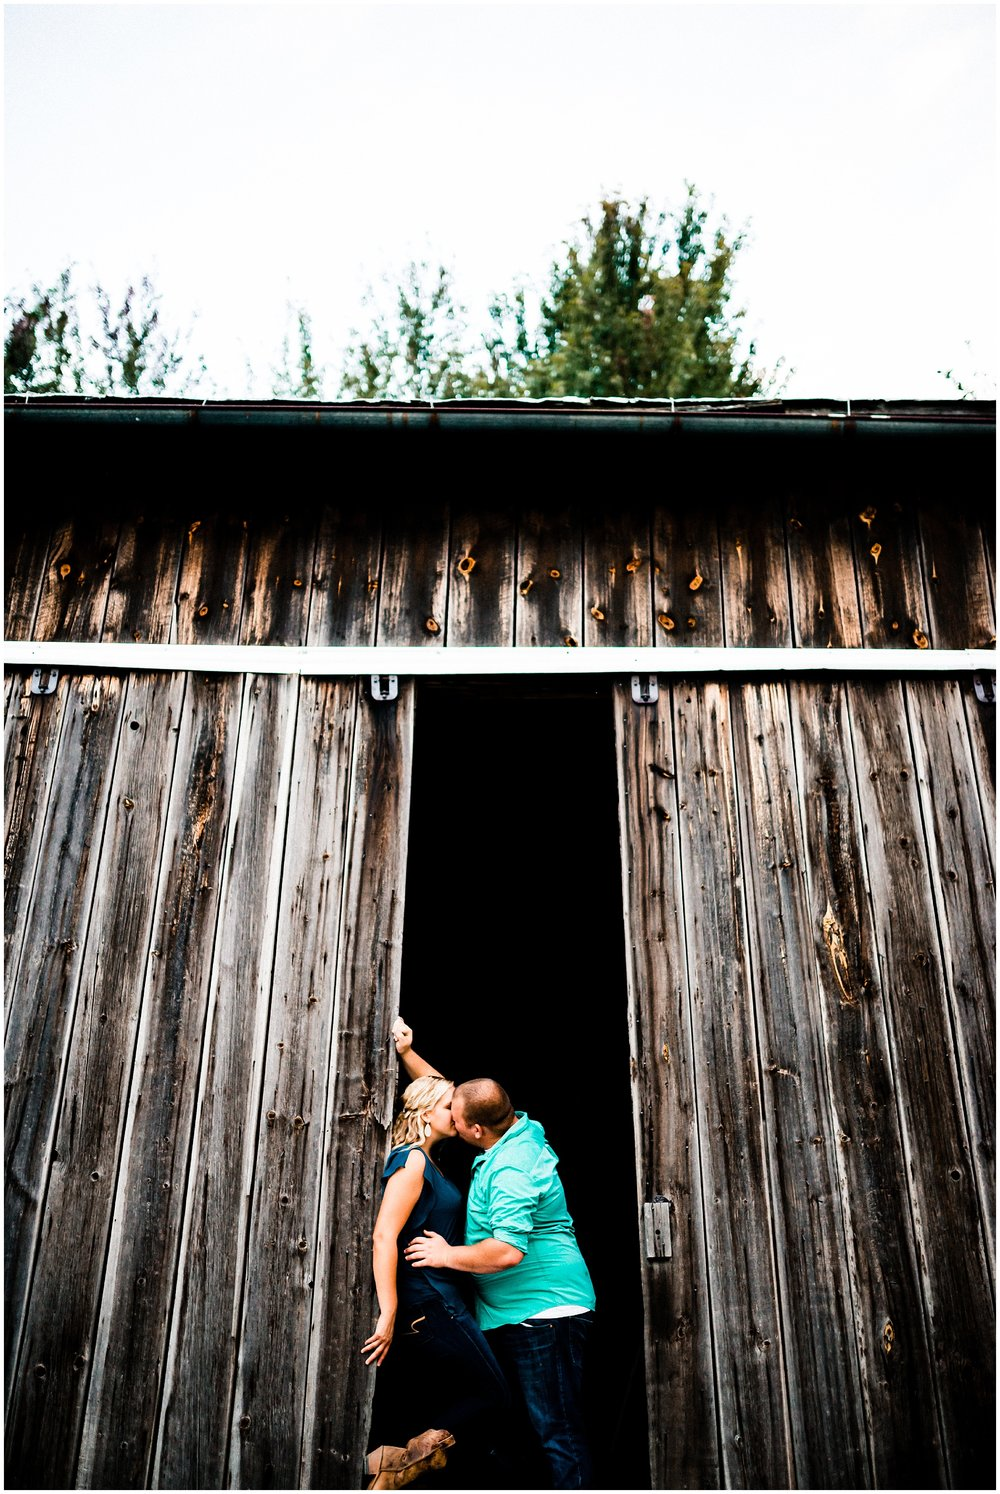 Nate + Tamryn | Engaged #kyleepaigephotography_1047.jpg